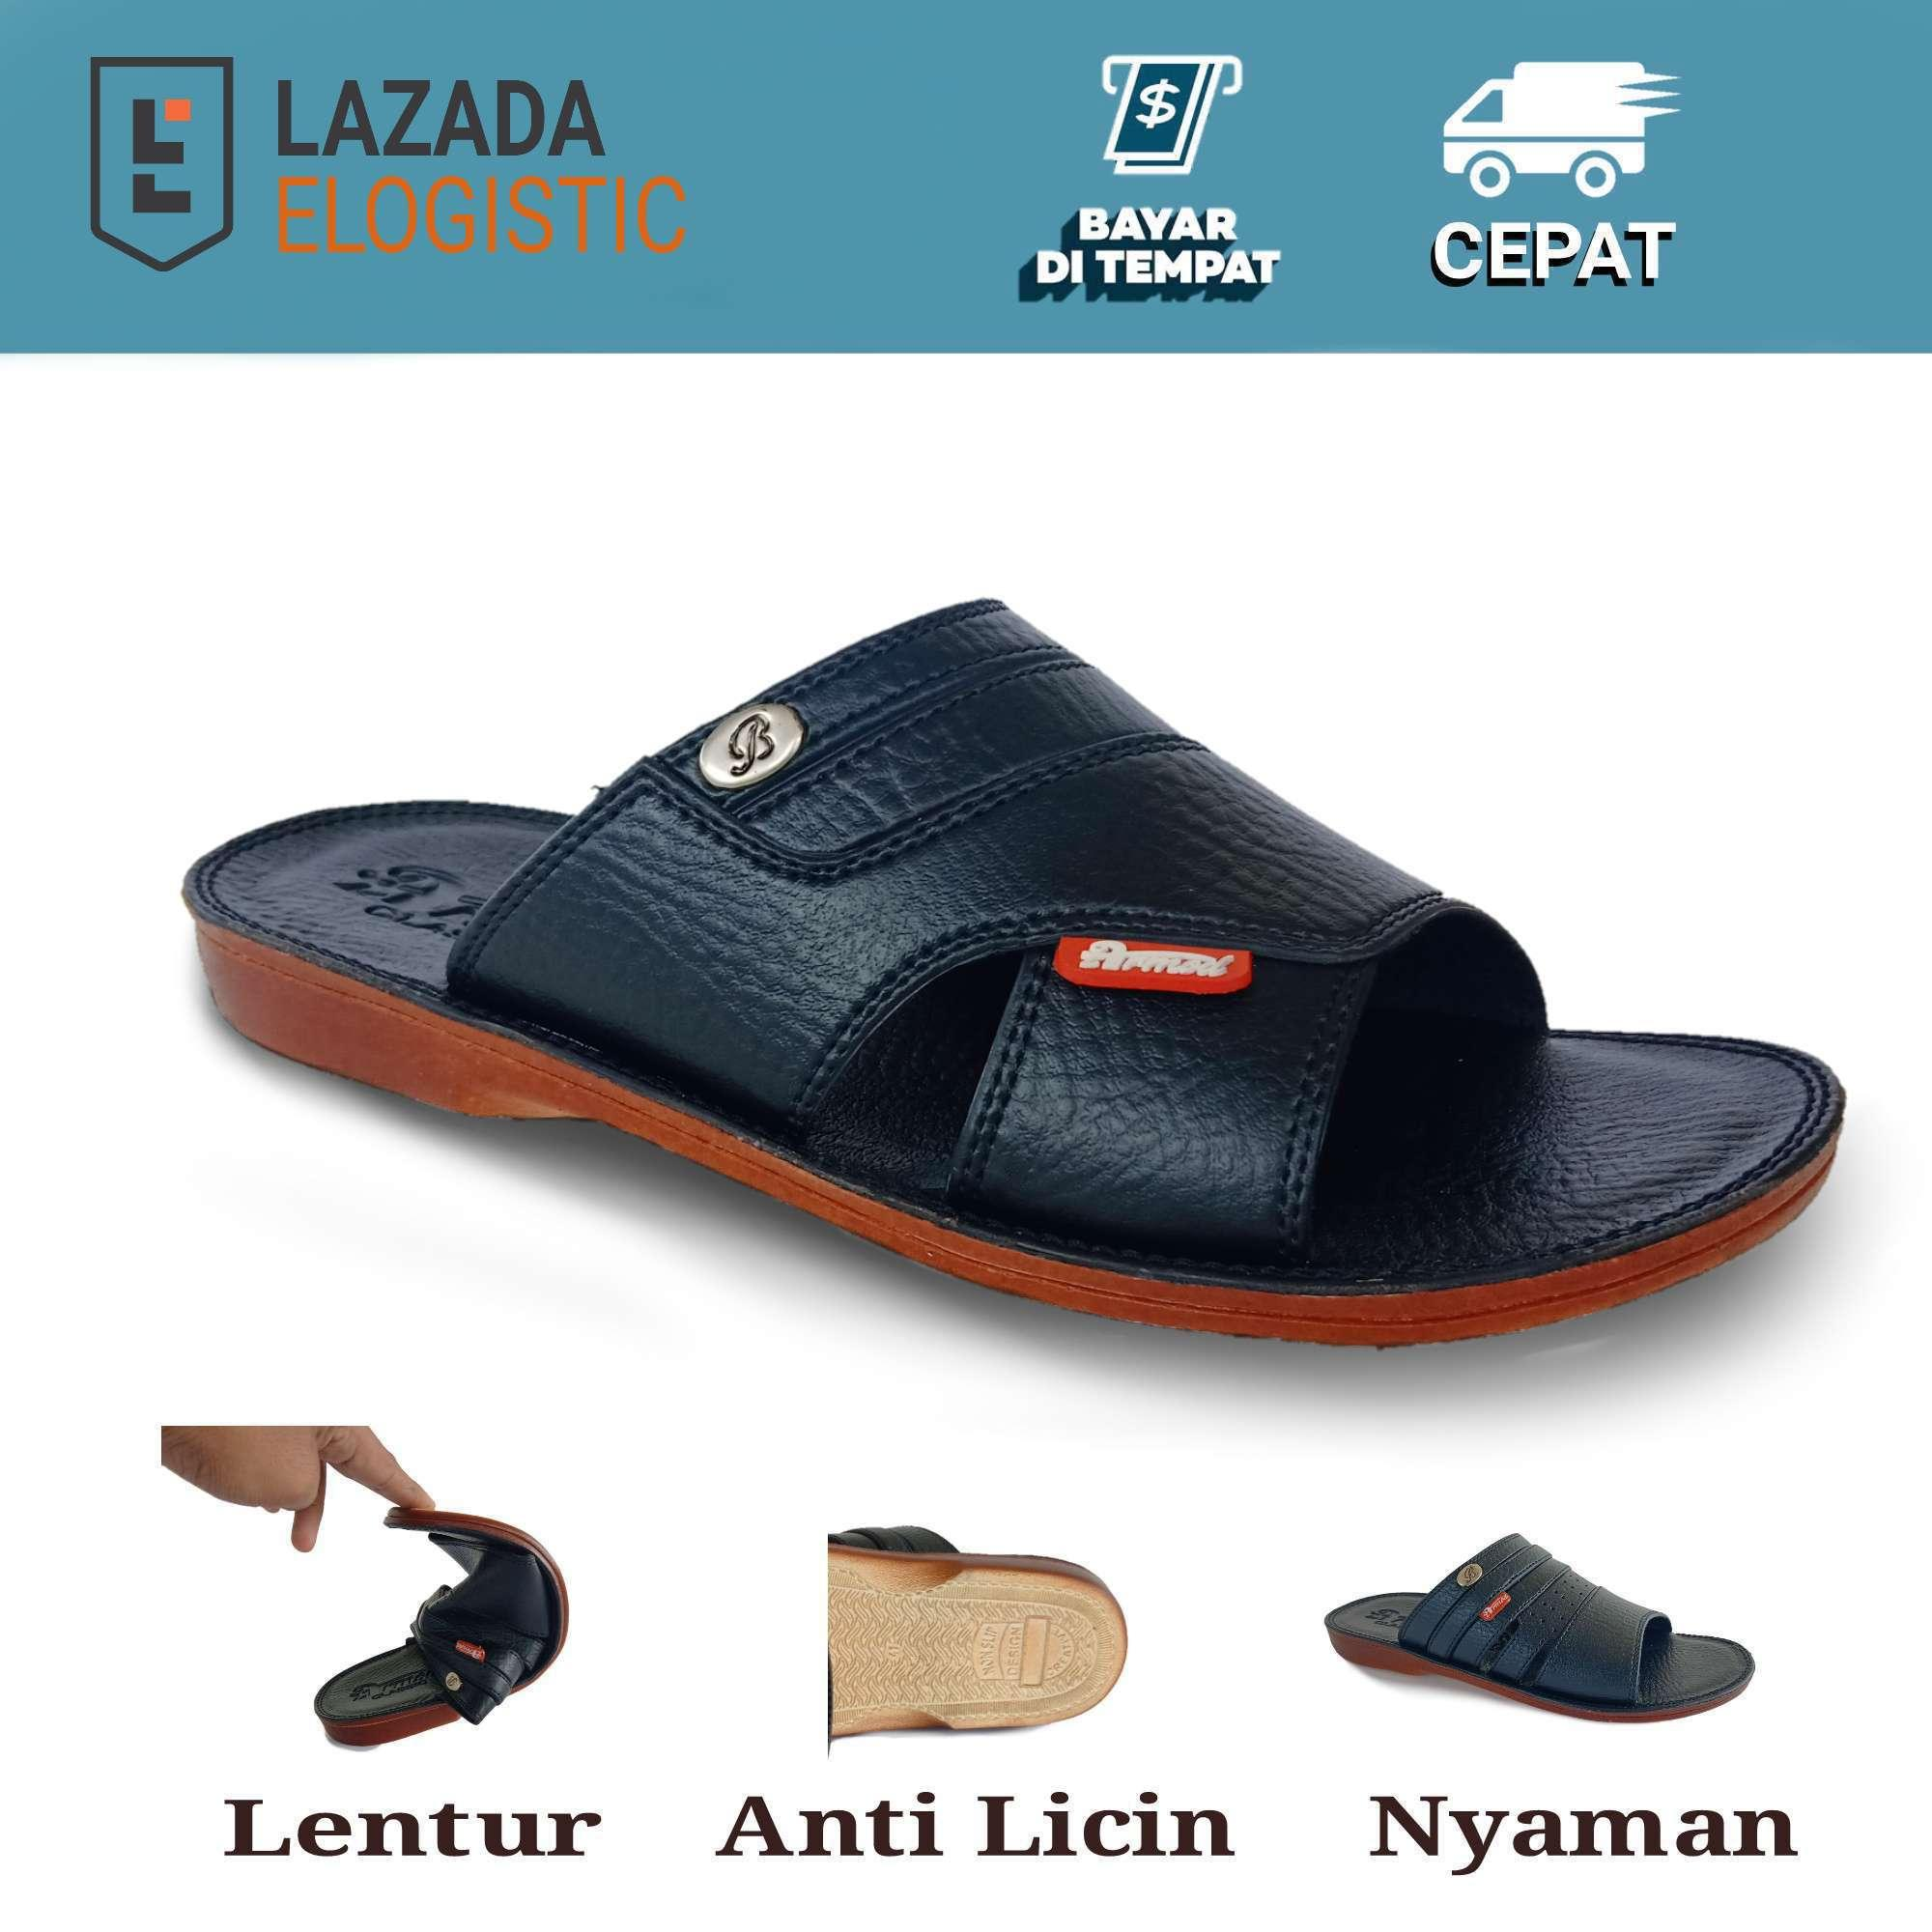 sandal pria / sandal pria kulit / sandal kulit casual / sandal pria kulit  / sandal pria  / sandal kulit santai / armod sbr 031